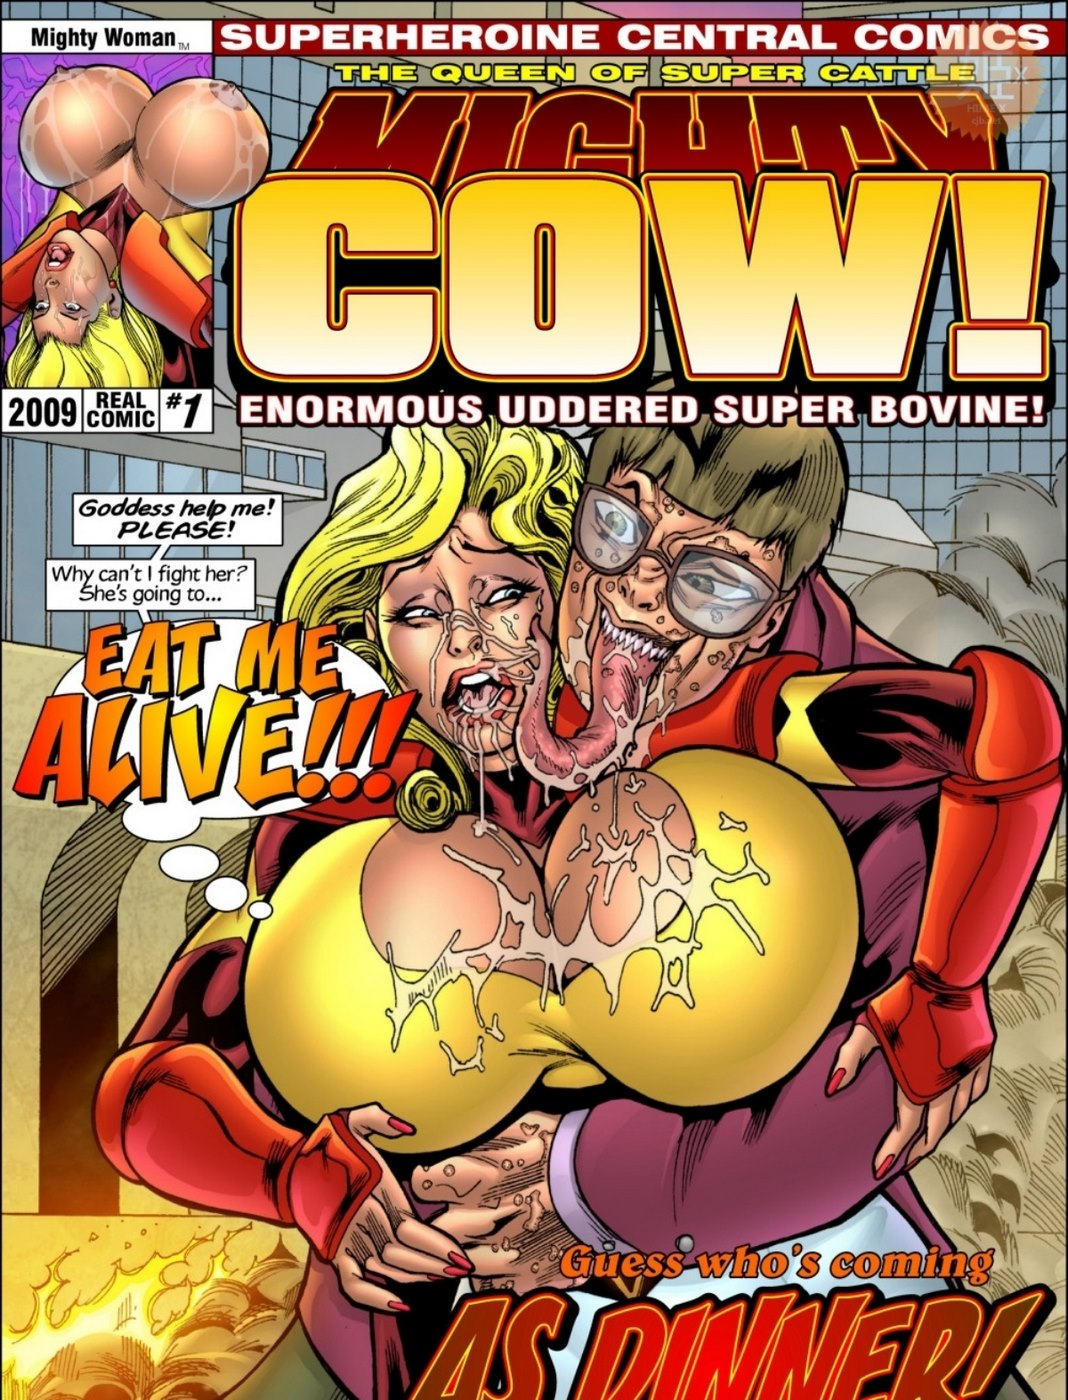 Porn Comics - 7 nights Date Night porn comics 8 muses